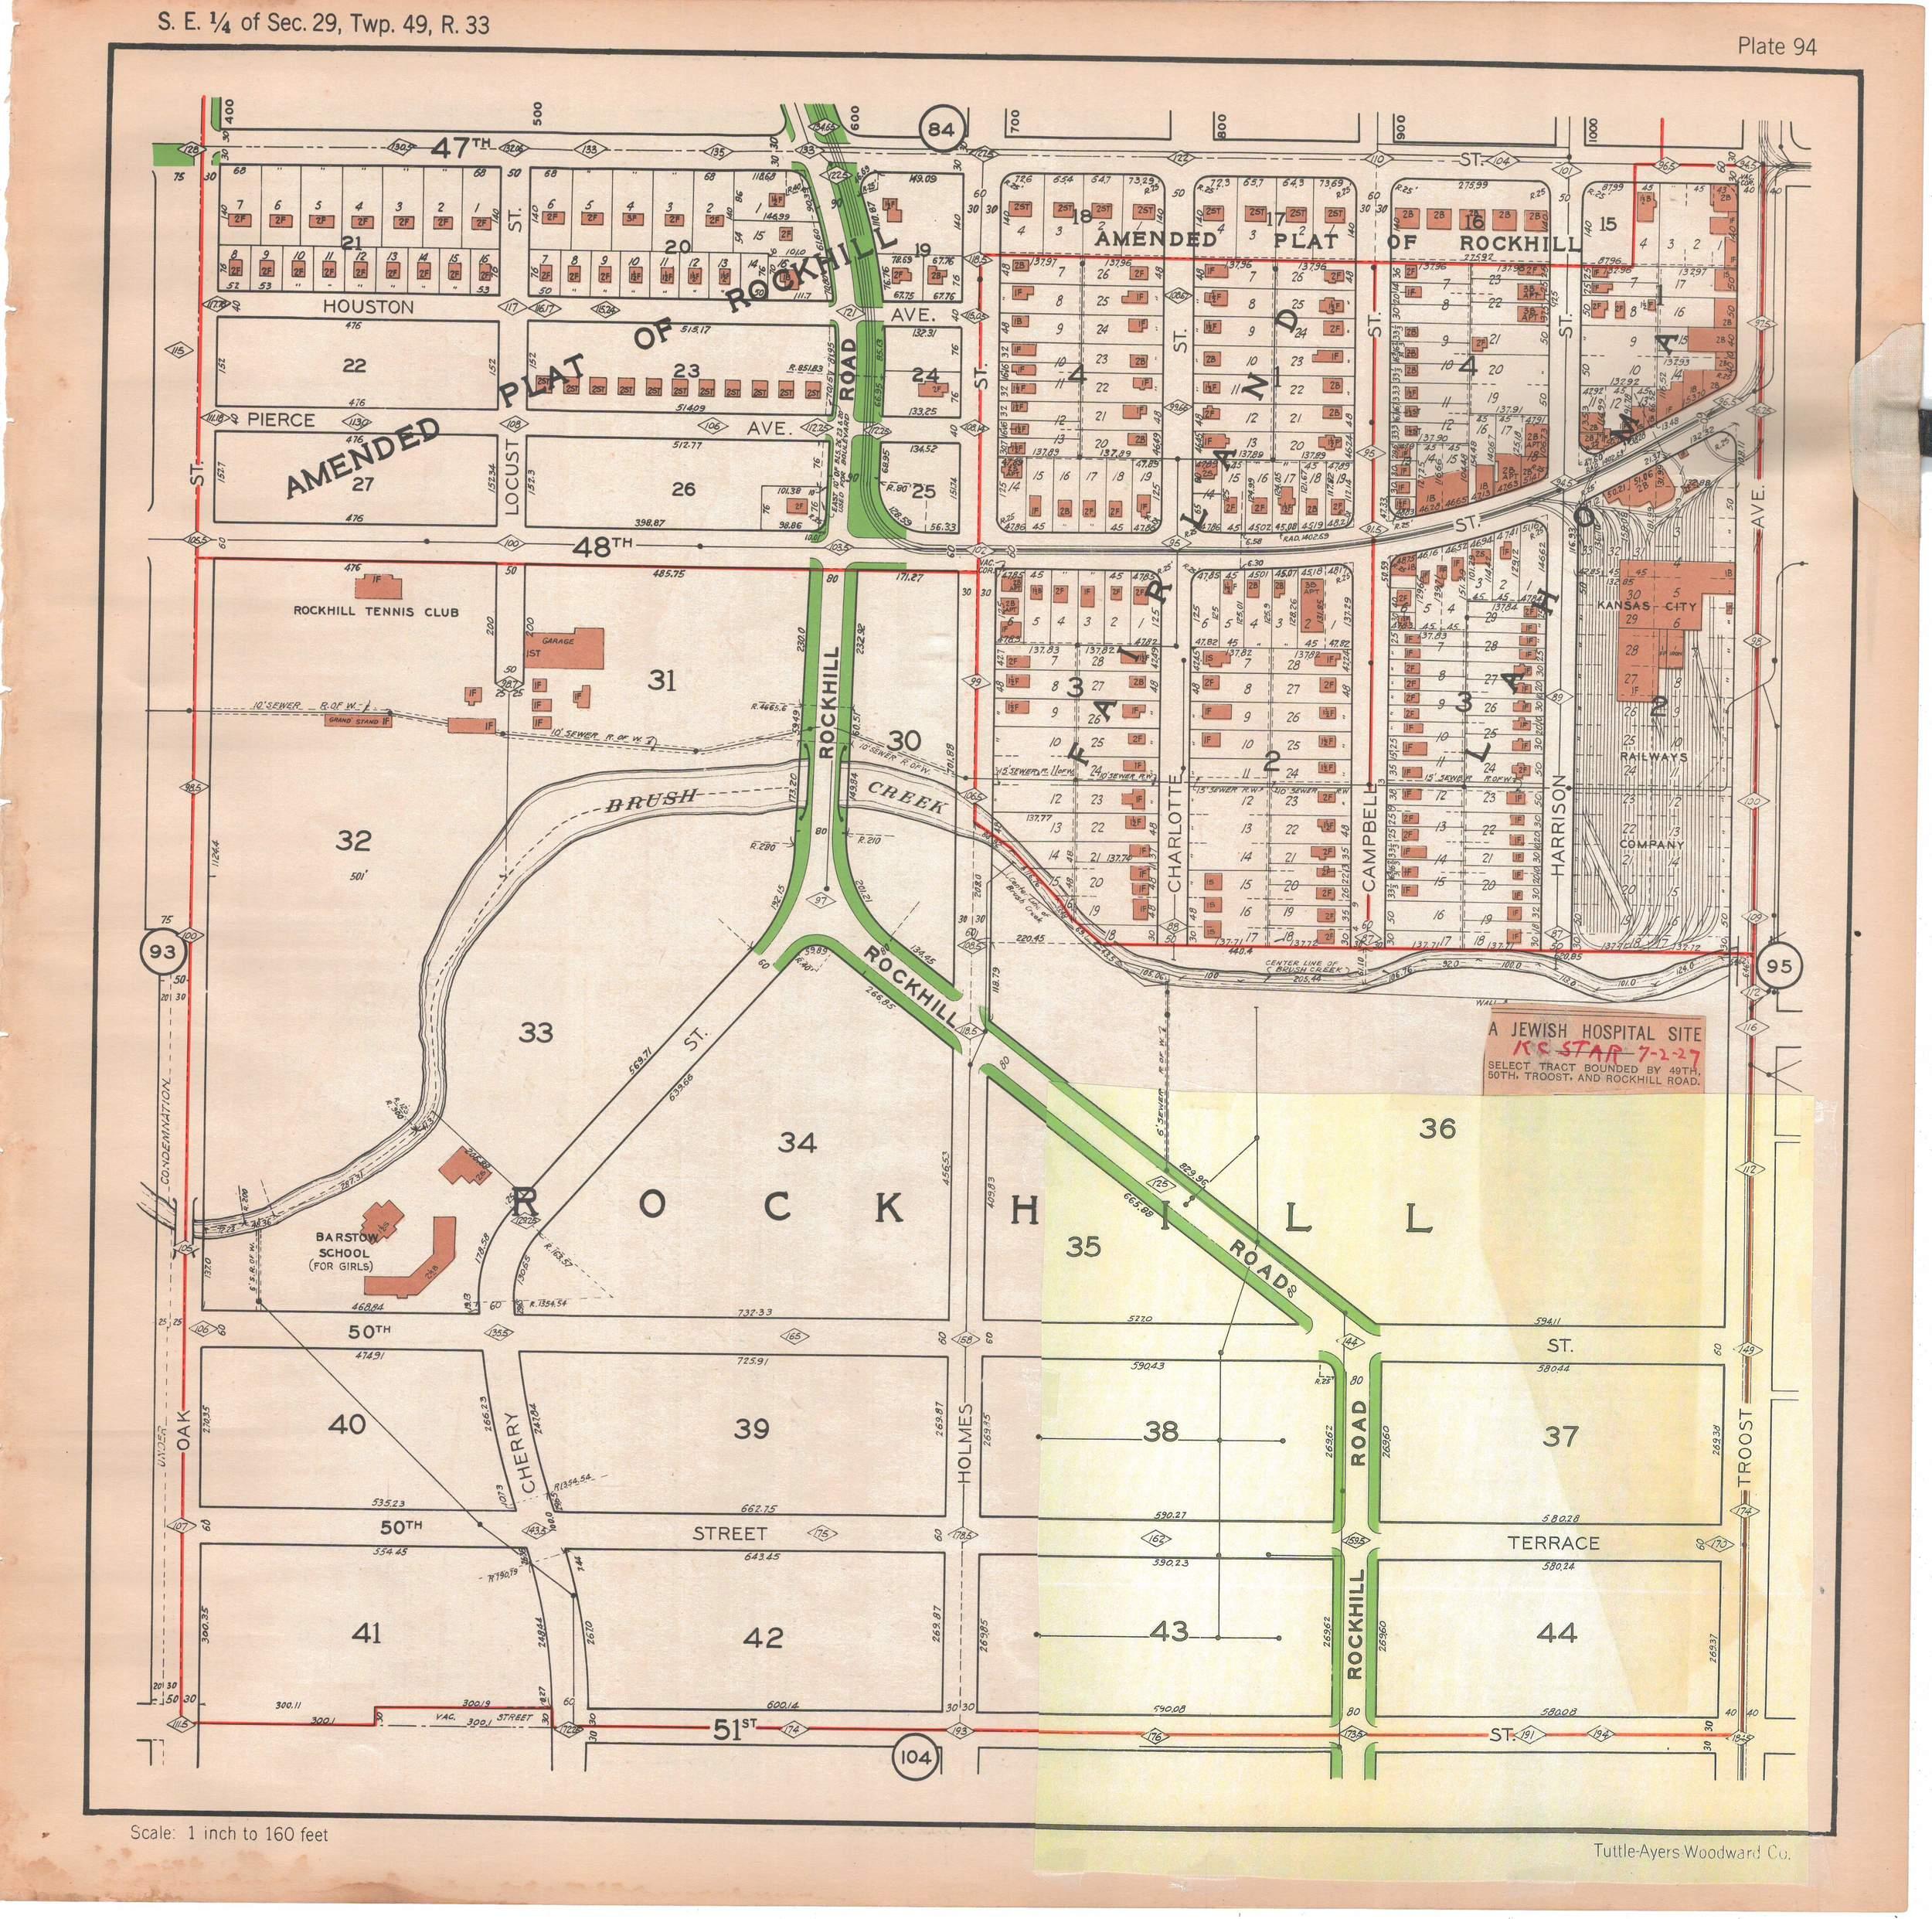 1925 TUTTLE_AYERS_Plate 94.JPG